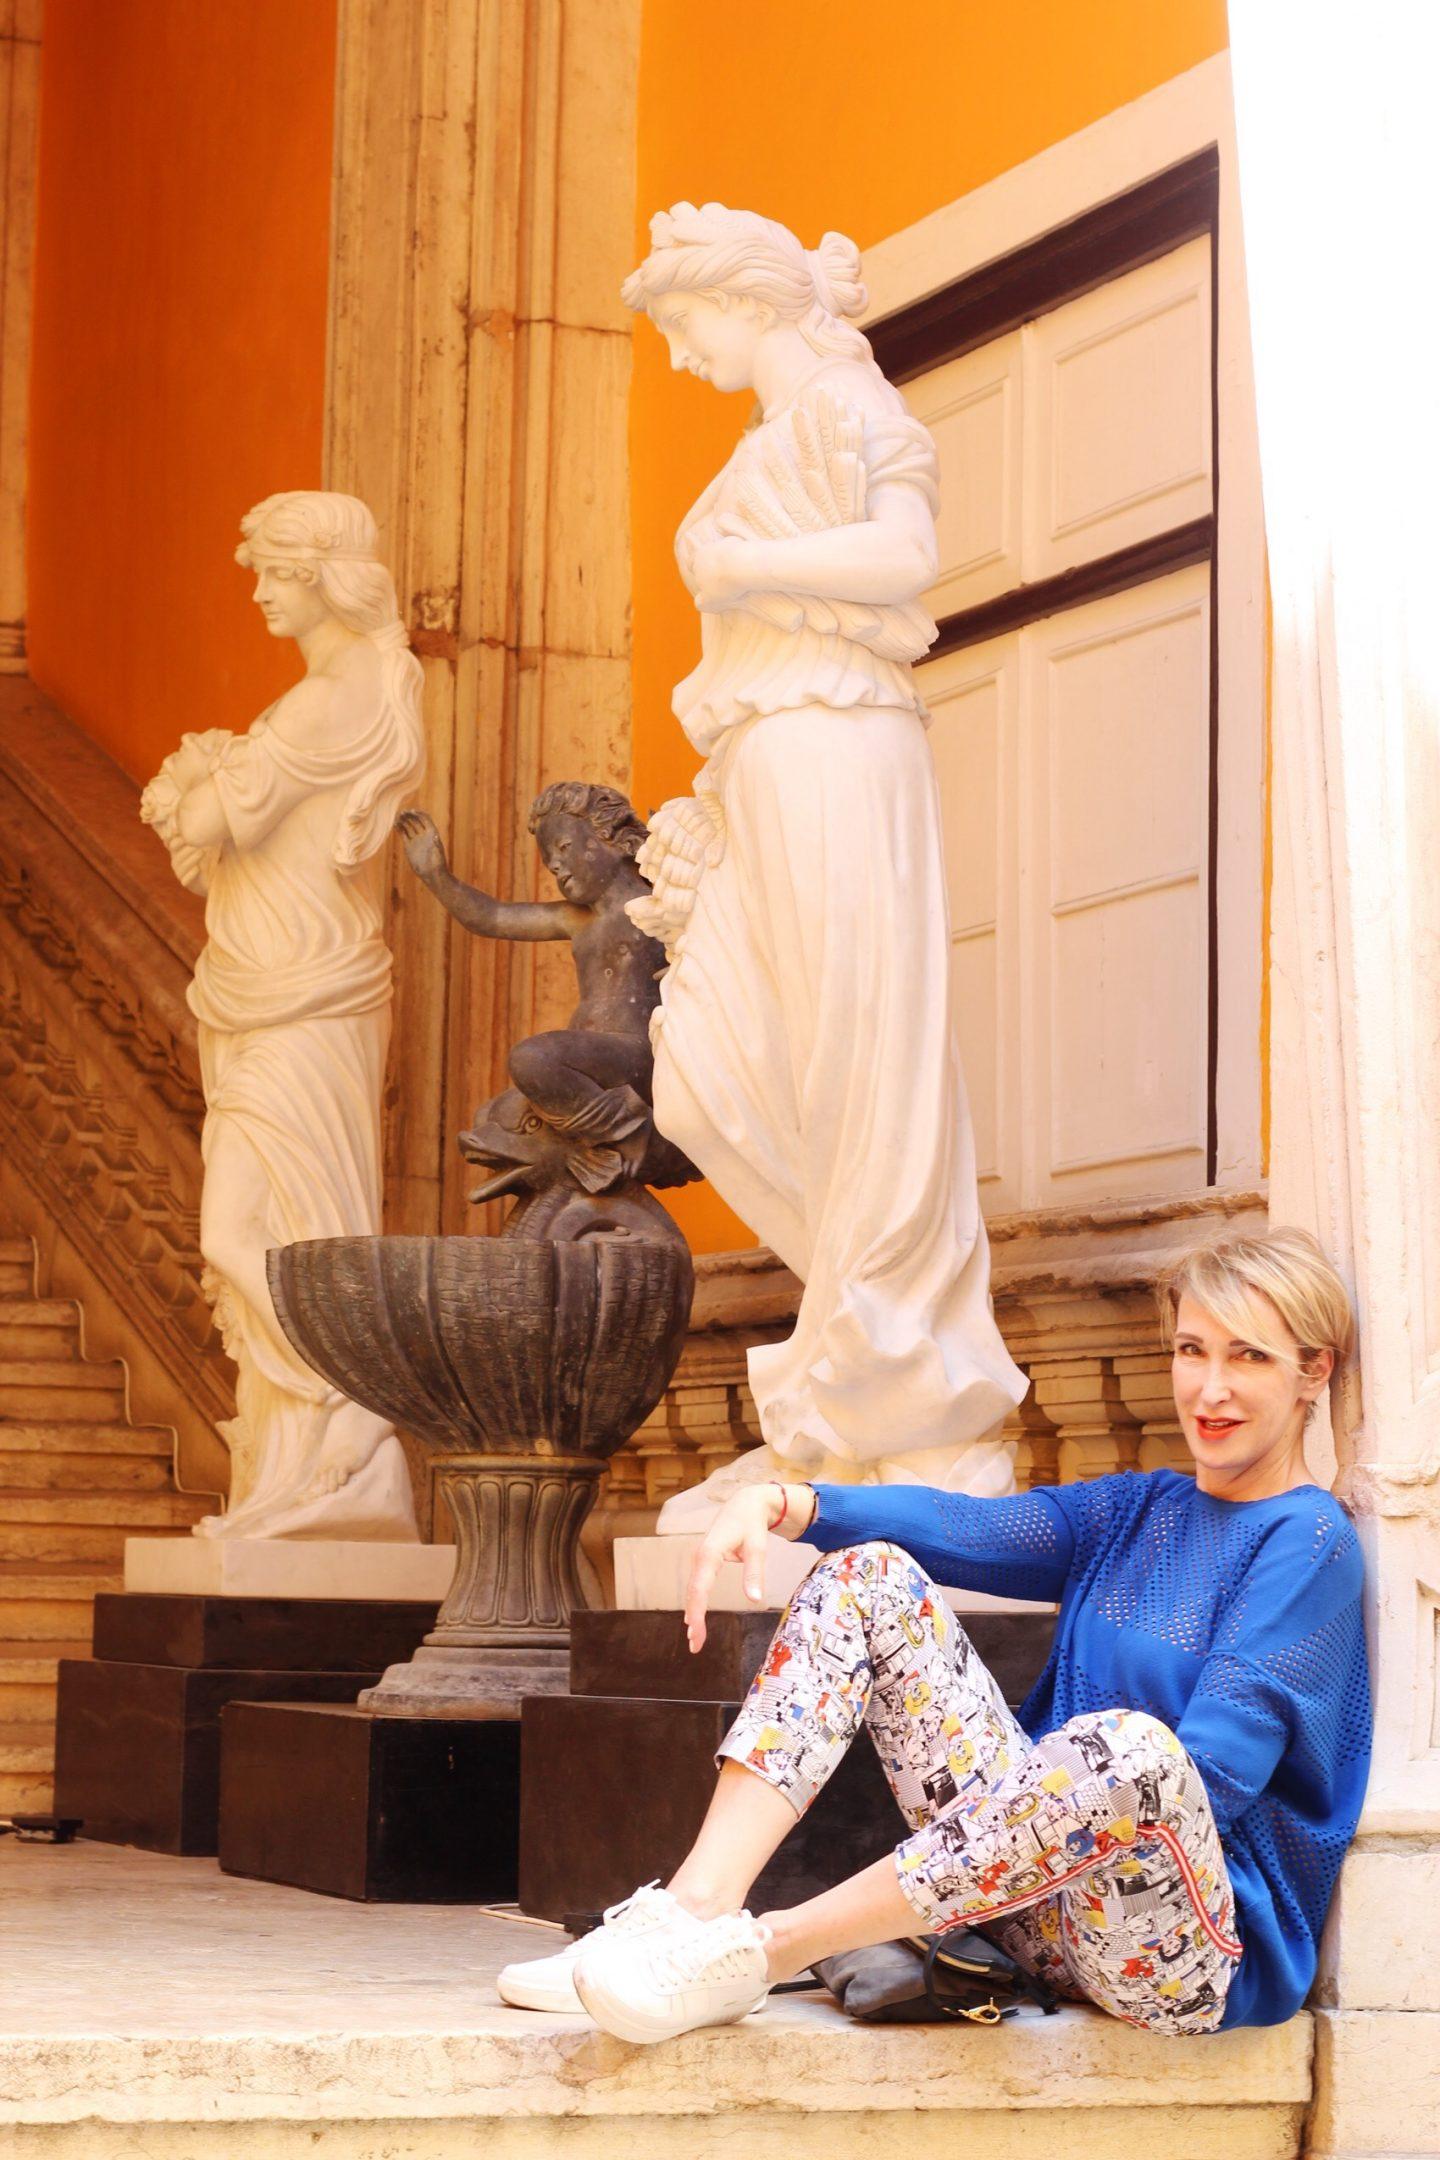 glamupyourlifestyle Frühlings-Outfit Frühlingsmode Sneaker Dorothee-Schumacher-Pullover ü-40-Blog ü-50-Blog ue-40-blog